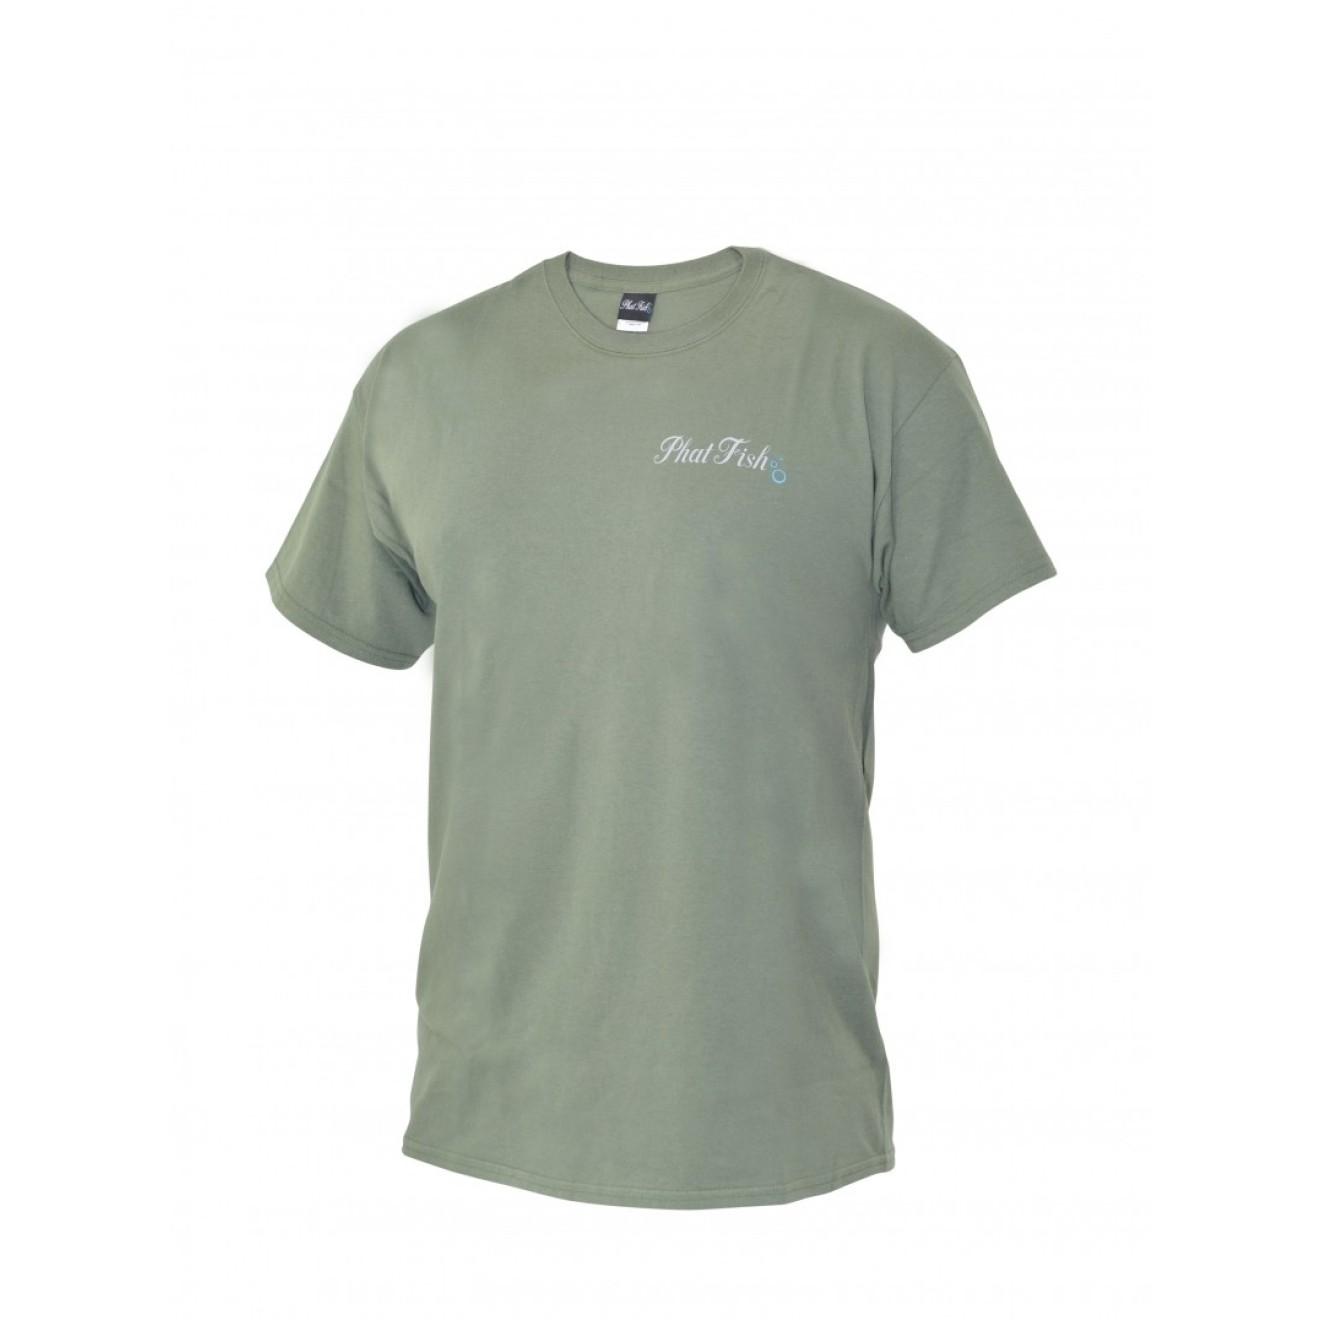 Phat fish logo t shirt khaki green xl carphunter co shop for Polo shirt with fish logo